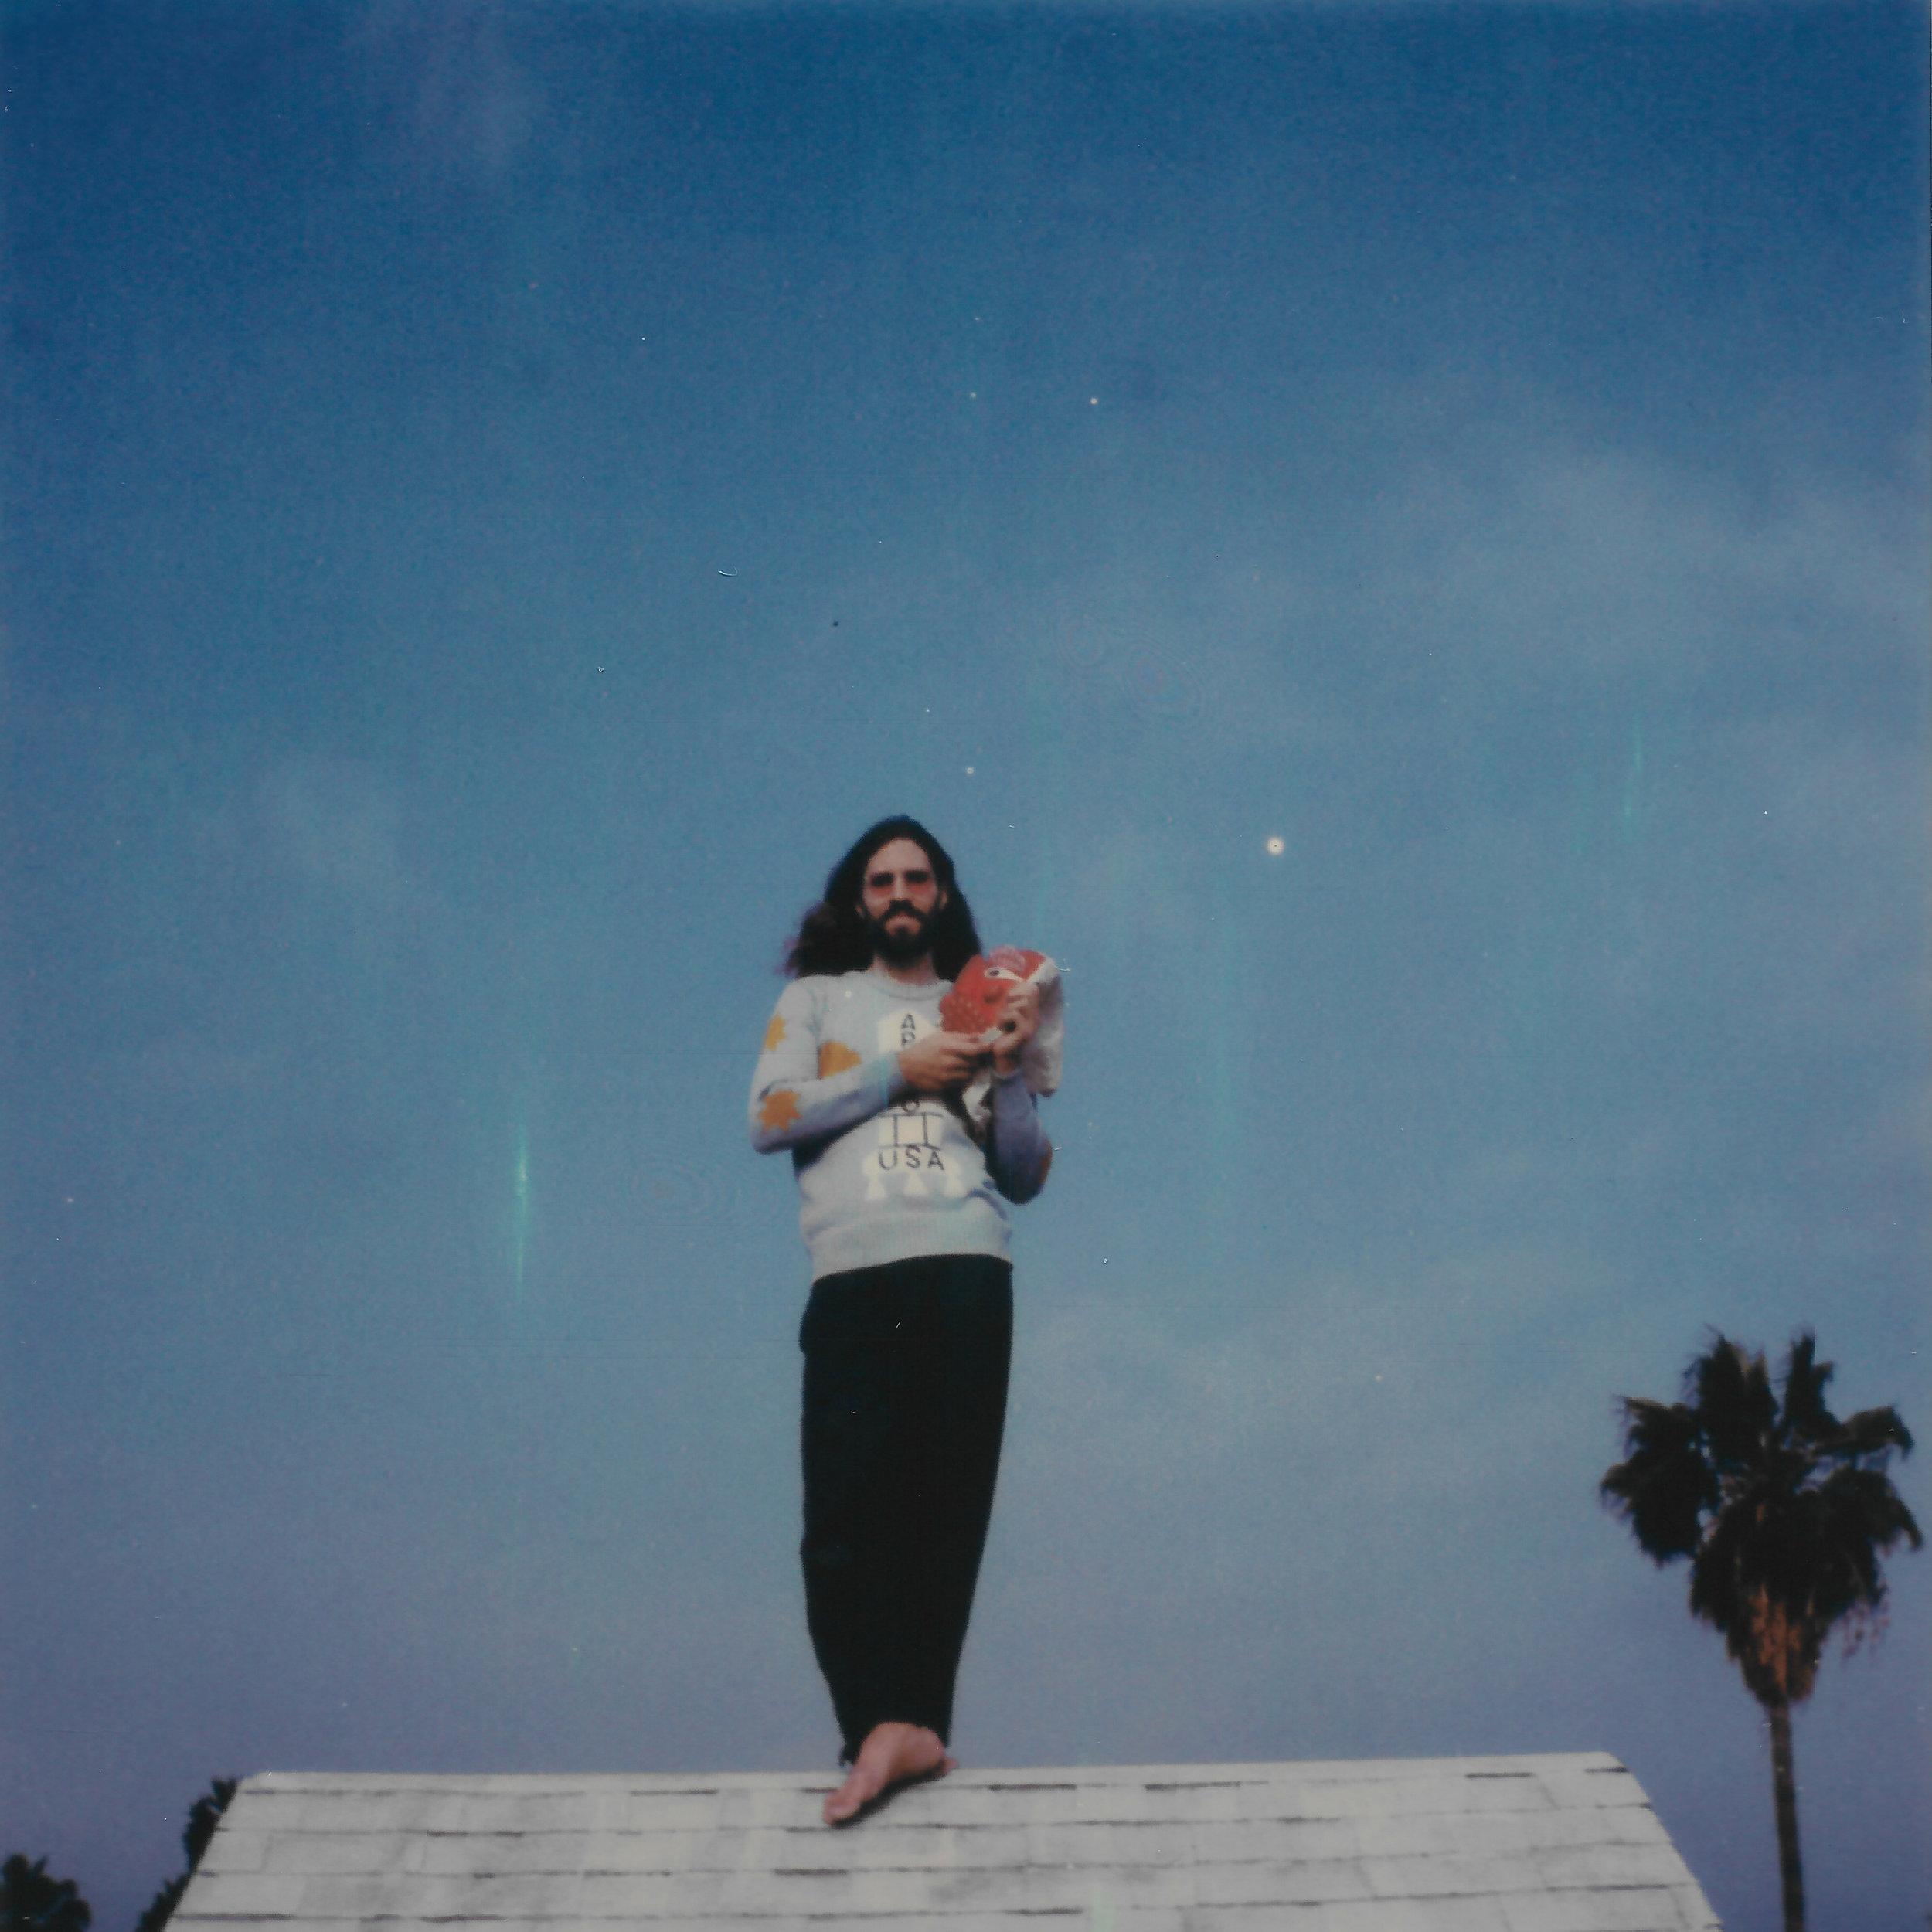 CJU Polaroid Lo-Fang 2 square.jpg